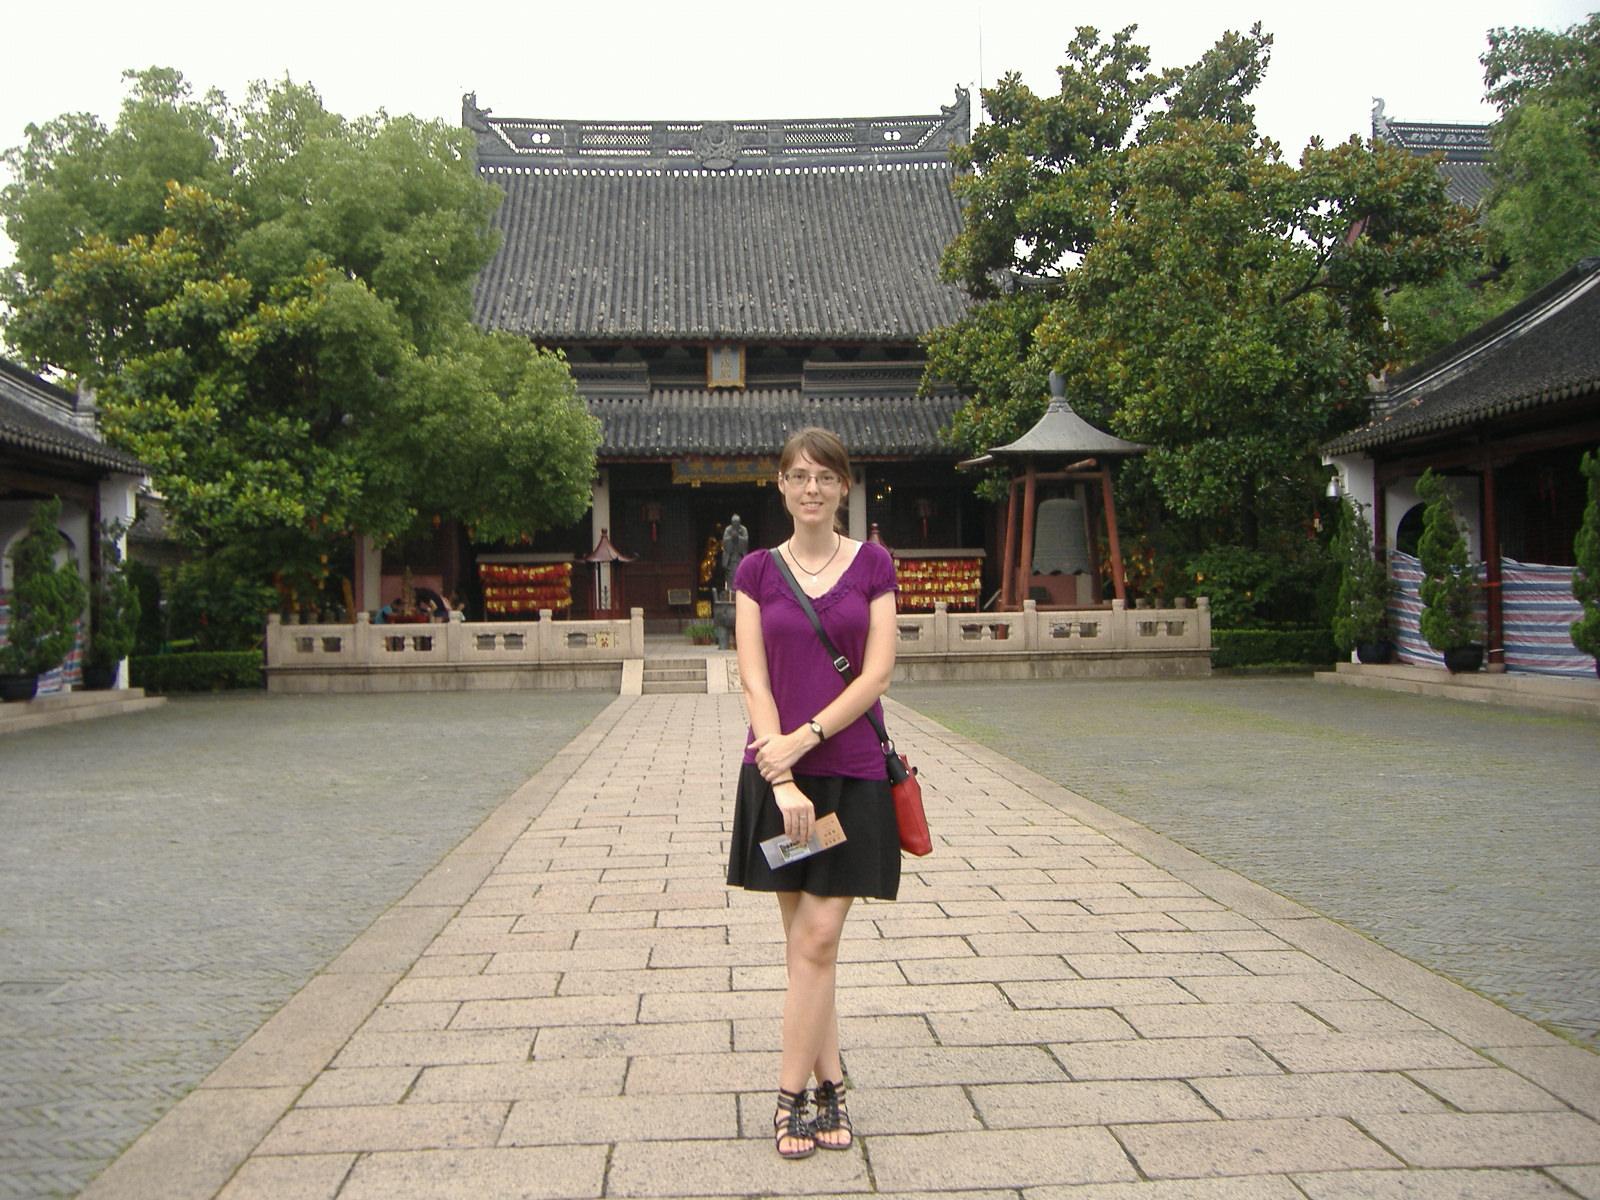 A konfuciánus templom előtt (上海文庙)- Huangpu,(黄埔区), Shanghai